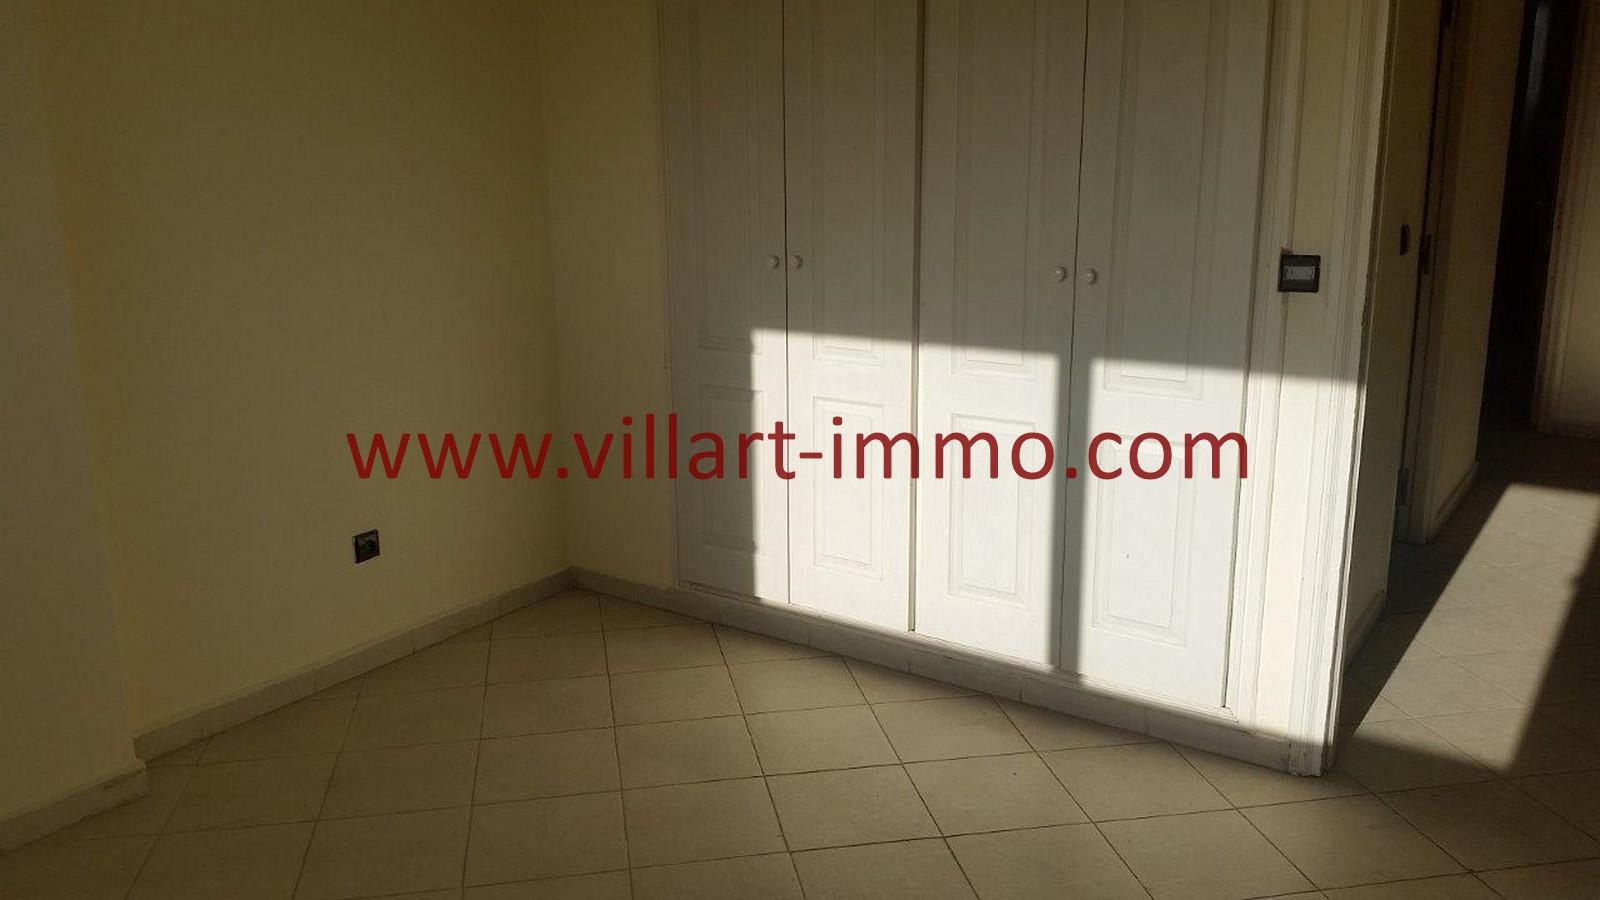 9-location-appartement-meubles-tanger-iberia-chambre-3-l1012-villart-immo-maroc